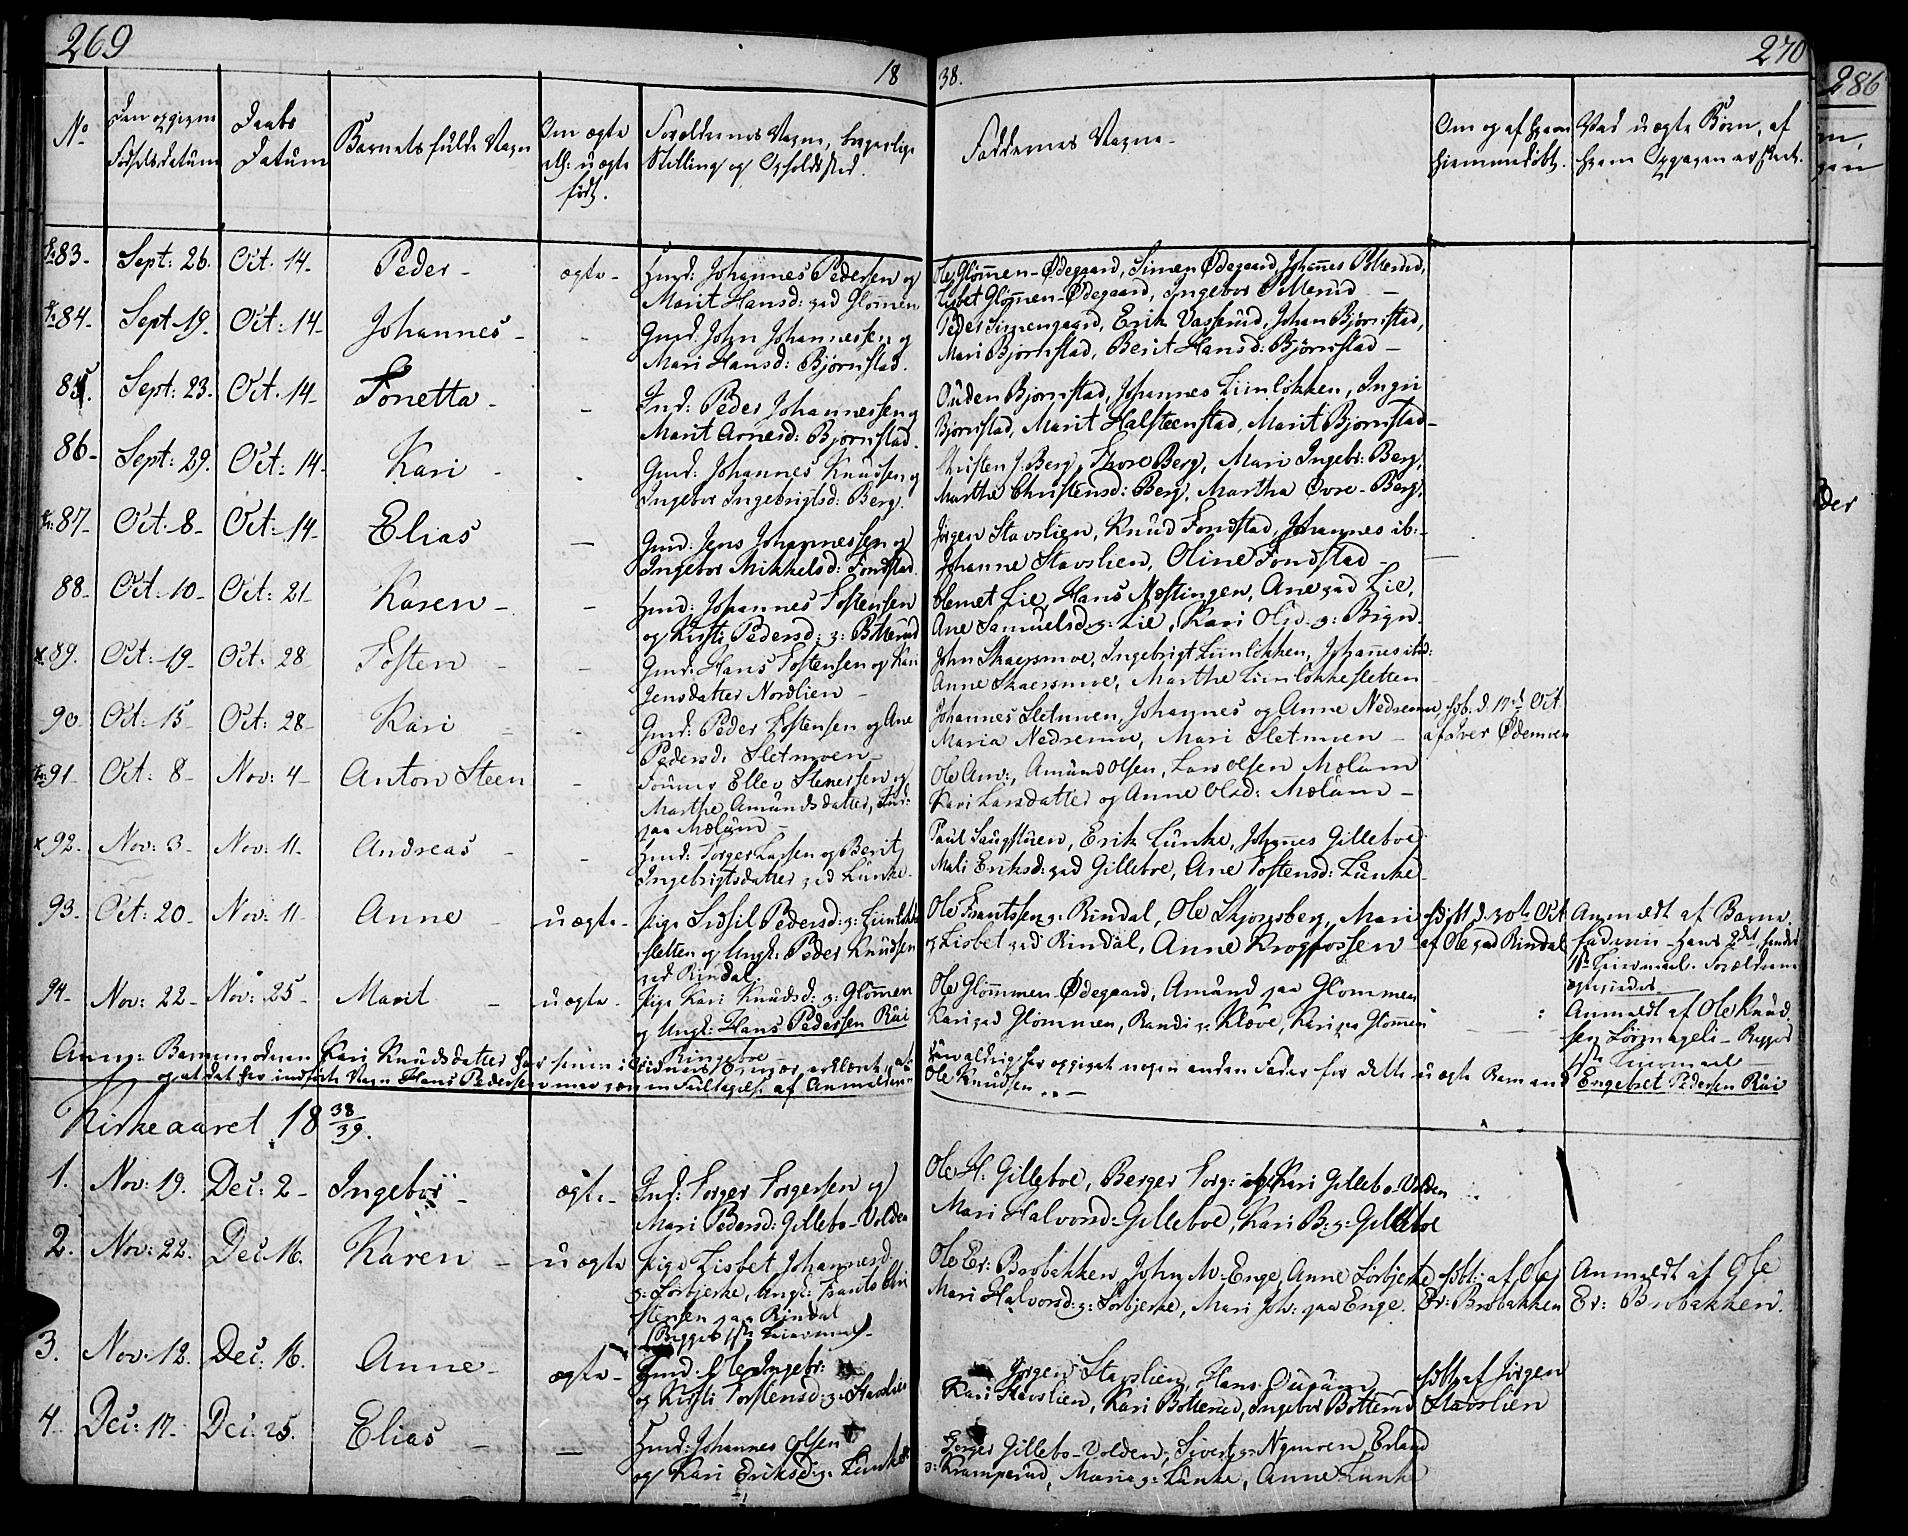 SAH, Øyer prestekontor, Ministerialbok nr. 4, 1824-1841, s. 269-270